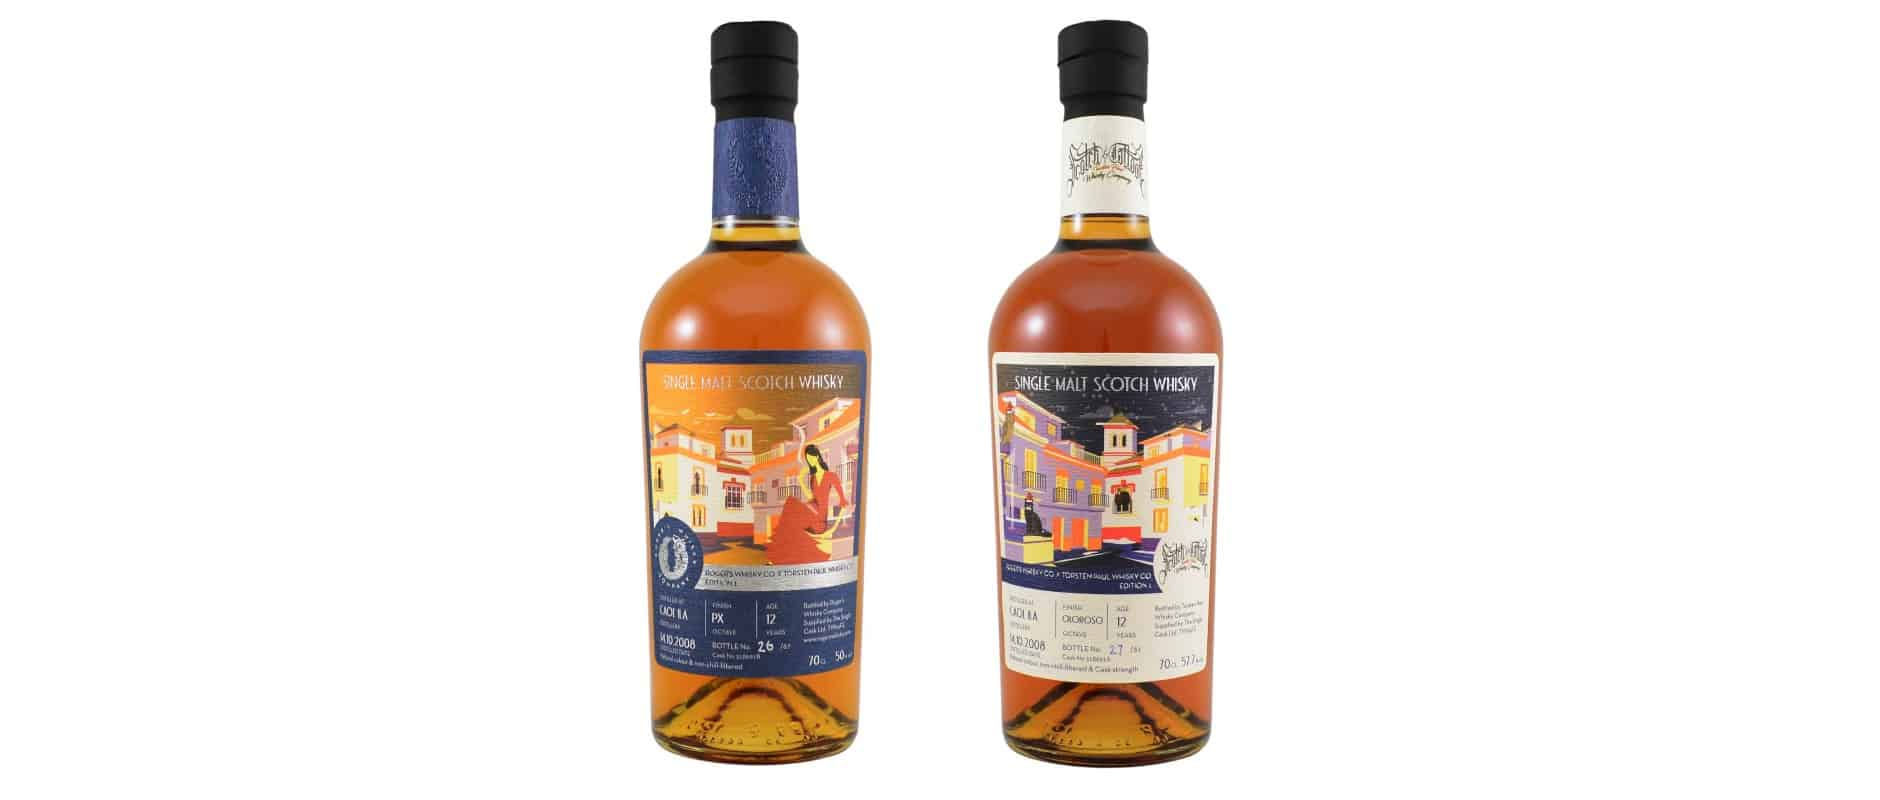 caol ila 2008 12yo torsten paul rogers whisky company